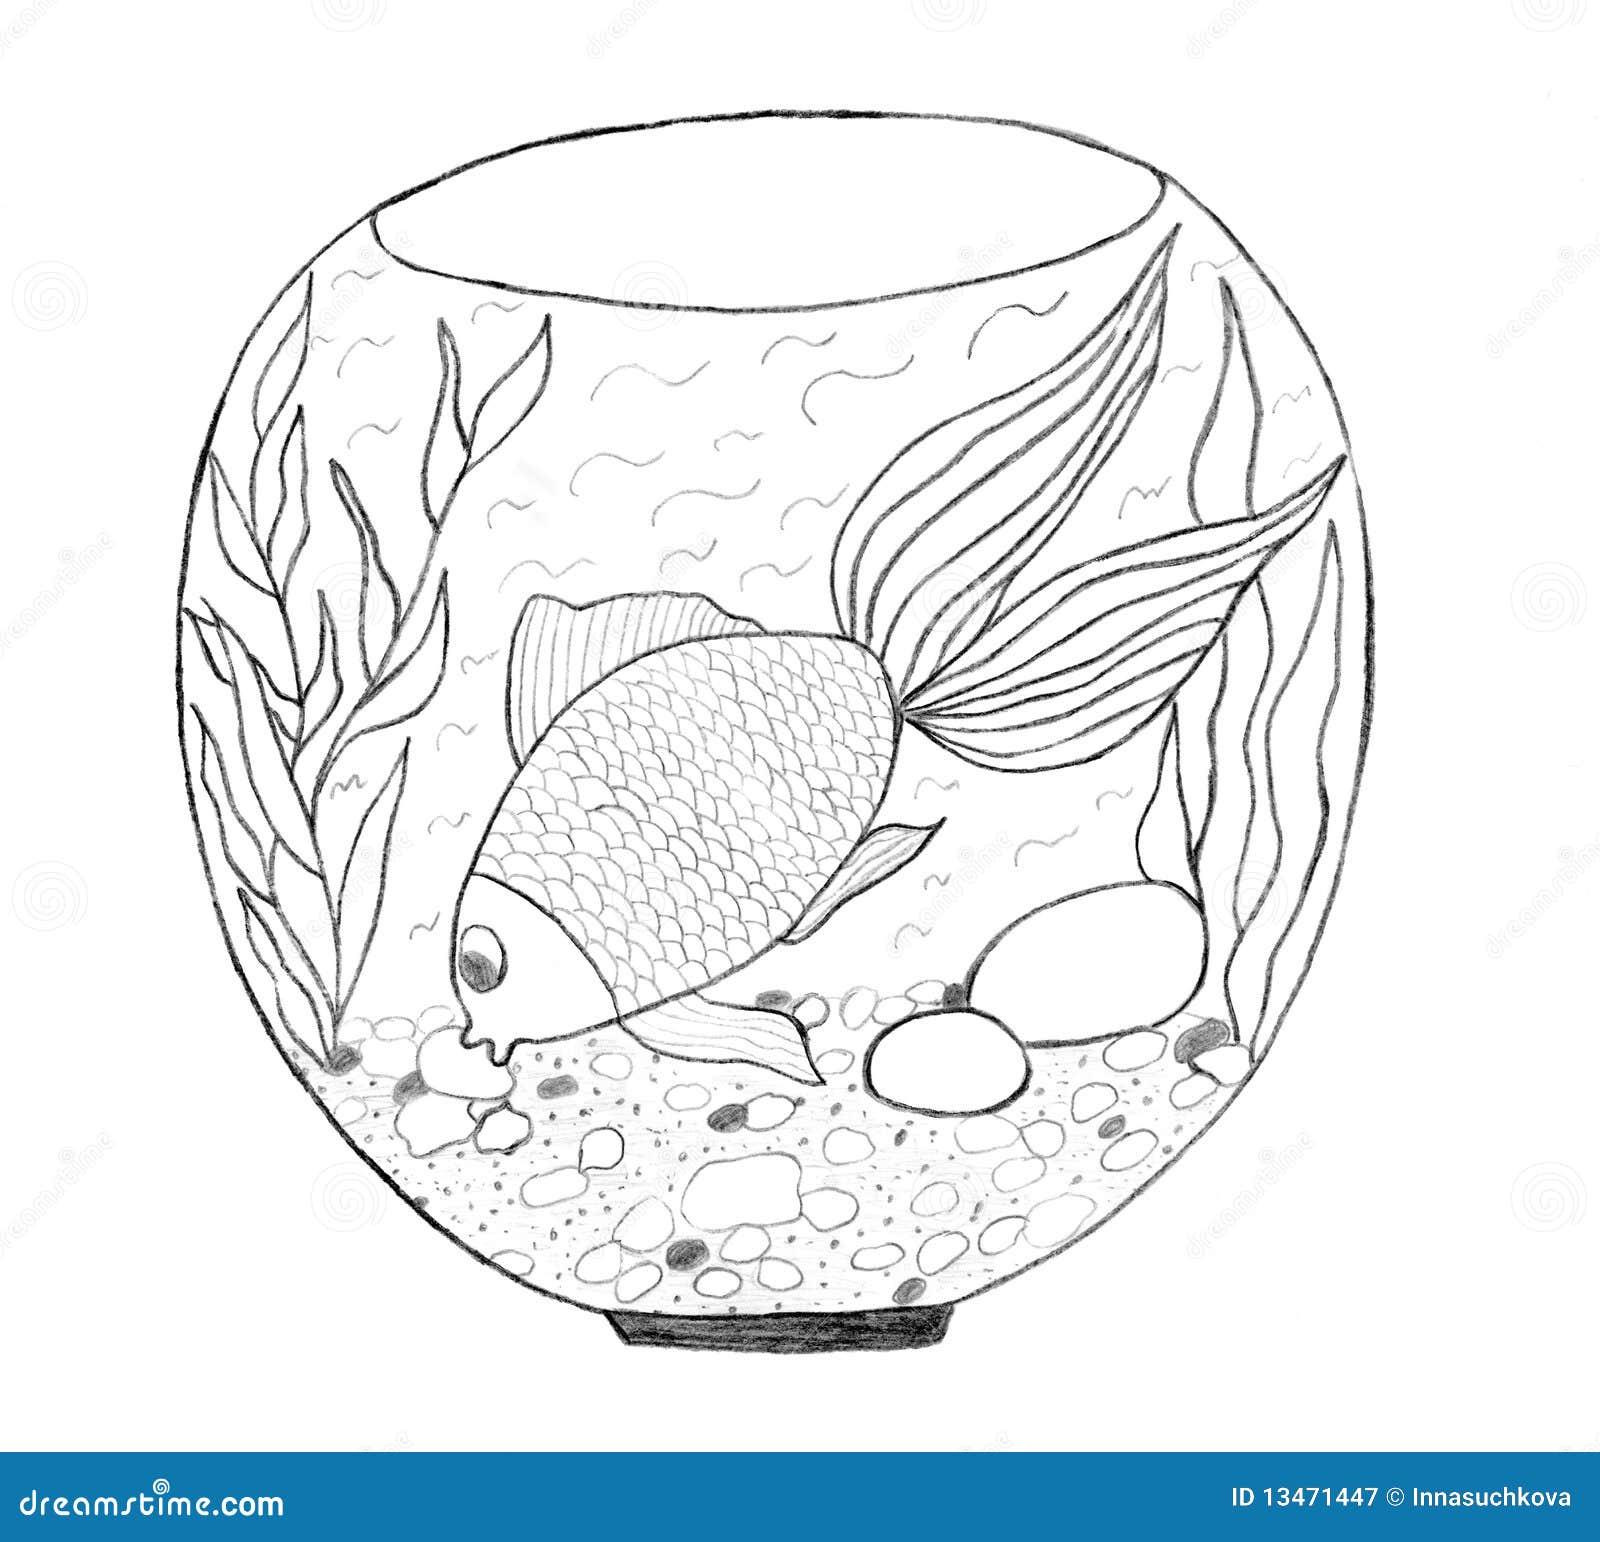 Aquarium Sketch Royalty Free Stock Photography